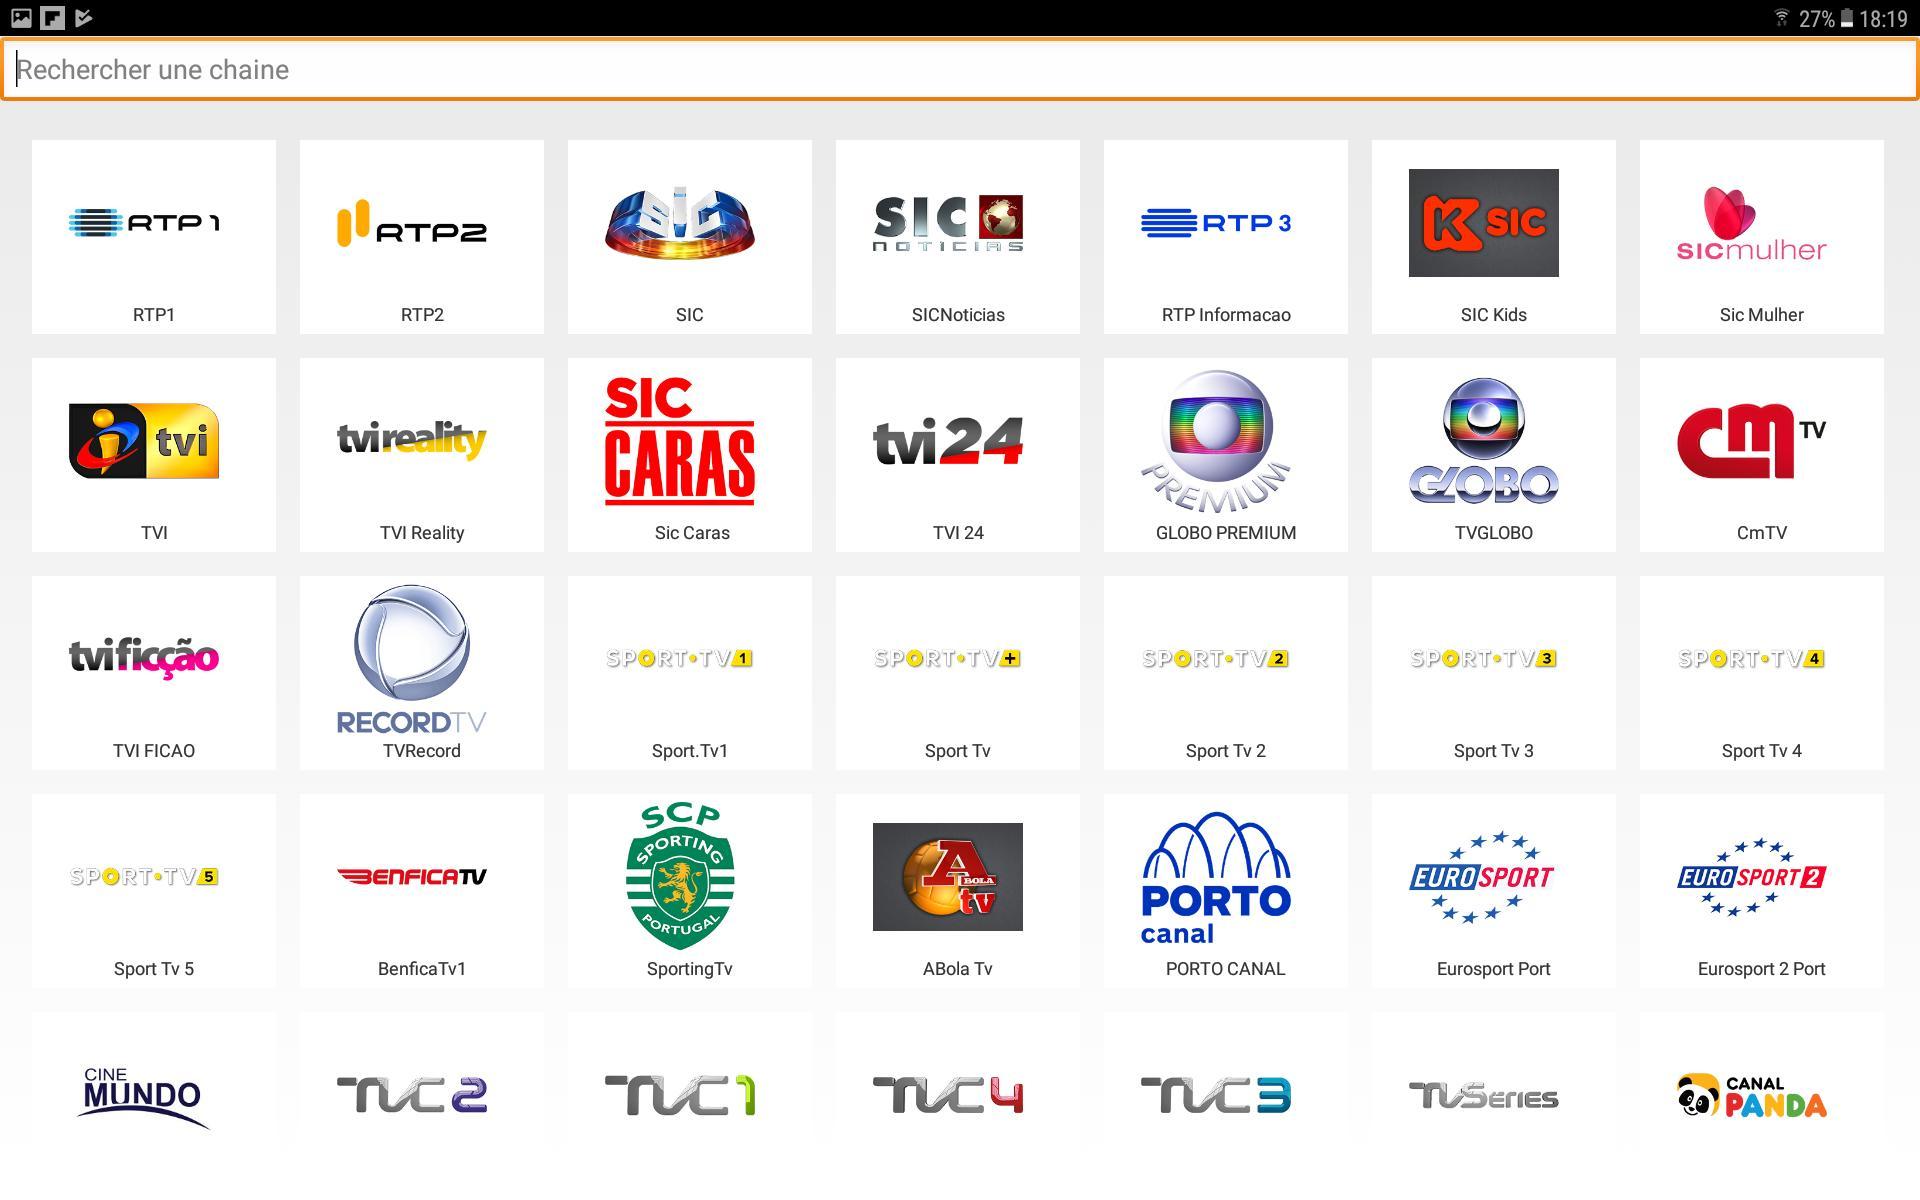 Portugal Tv para Android - APK Baixar